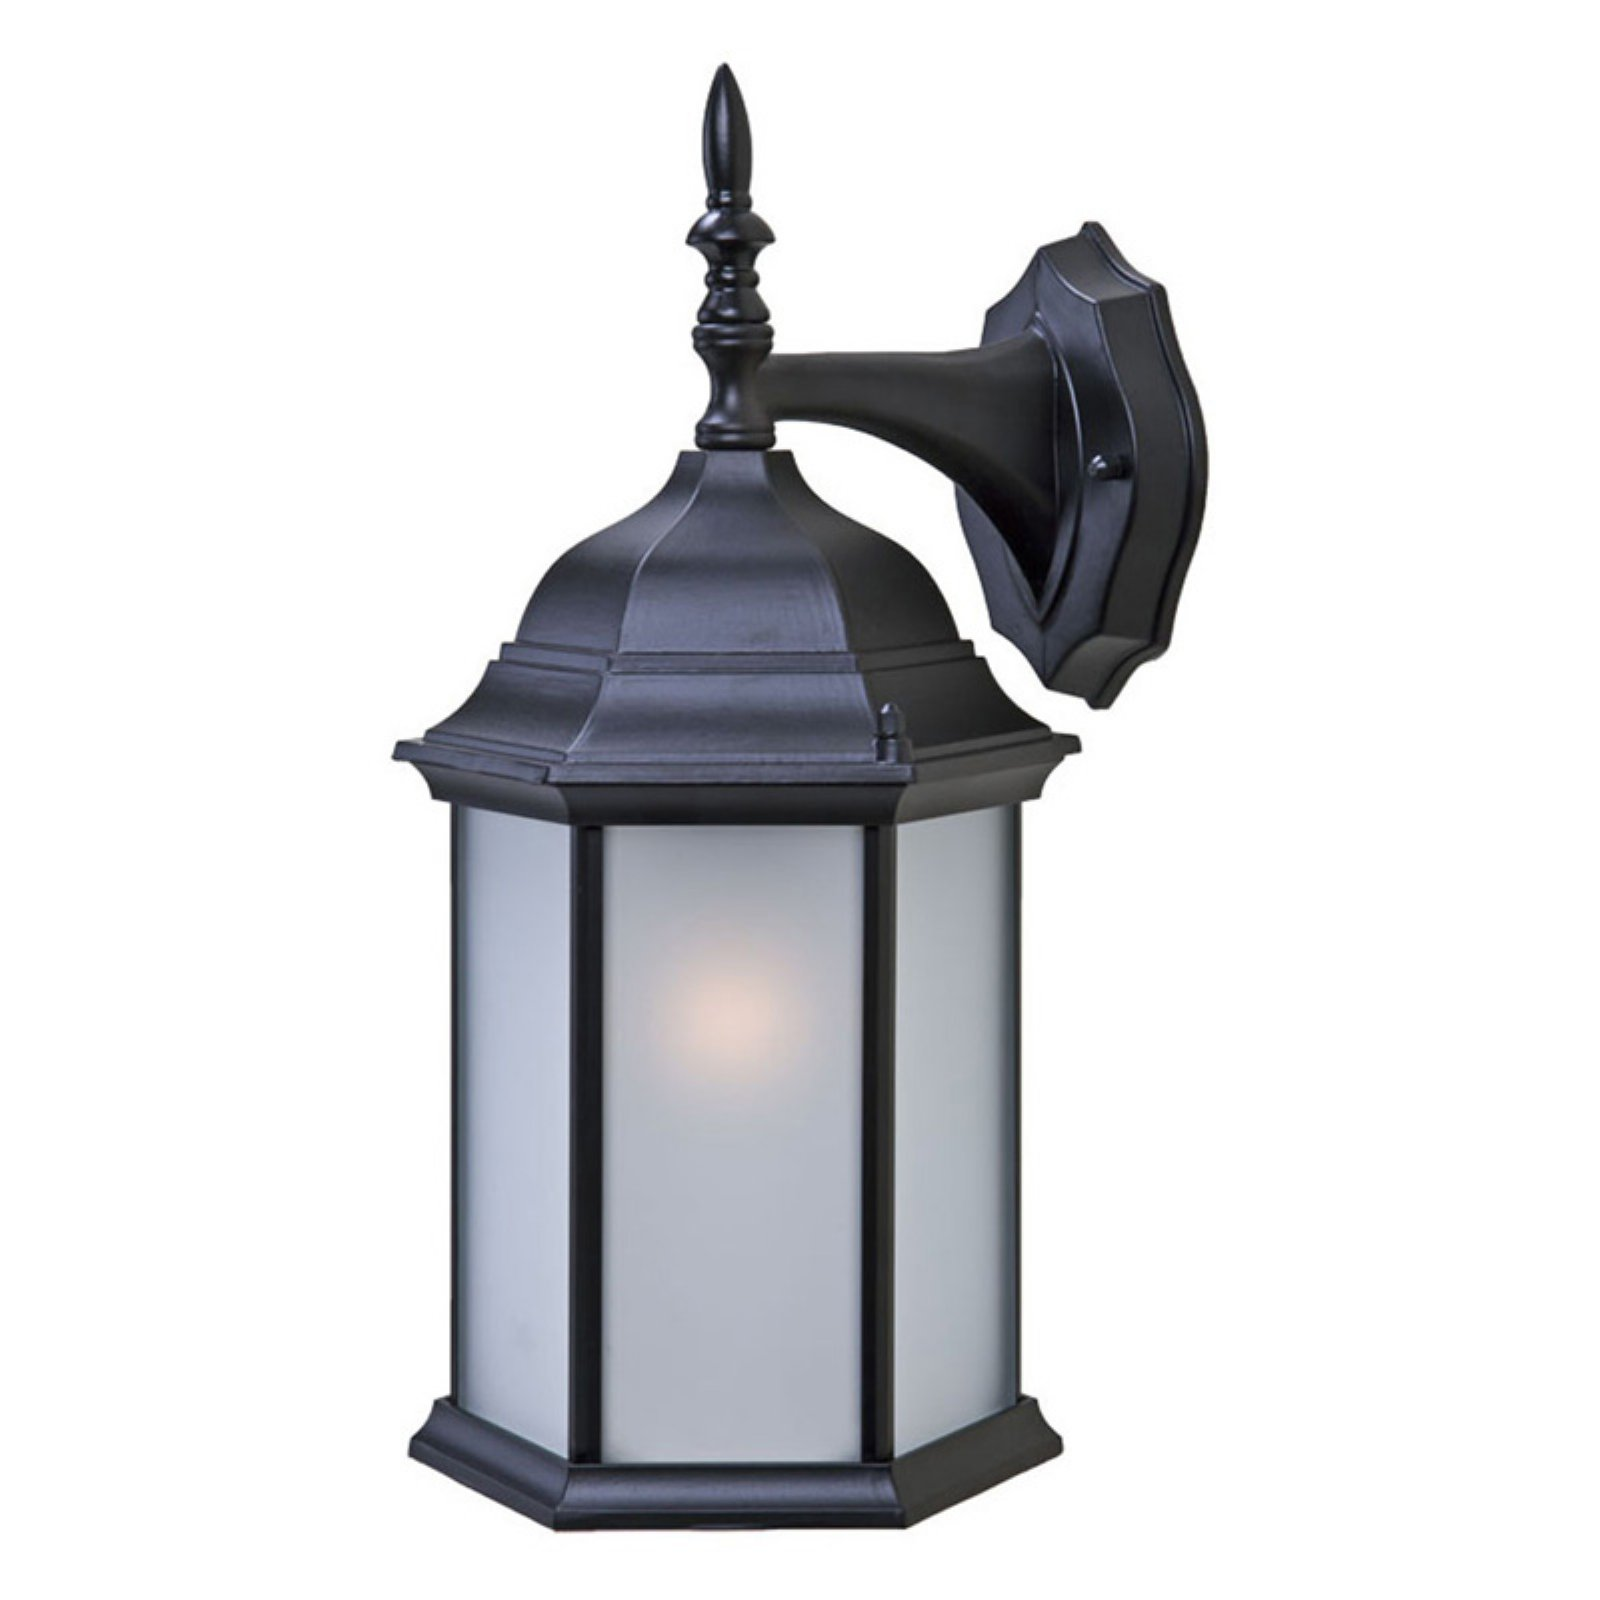 Acclaim Lighting Craftsman 8 in. Outdoor Wall Mount Light Fixture